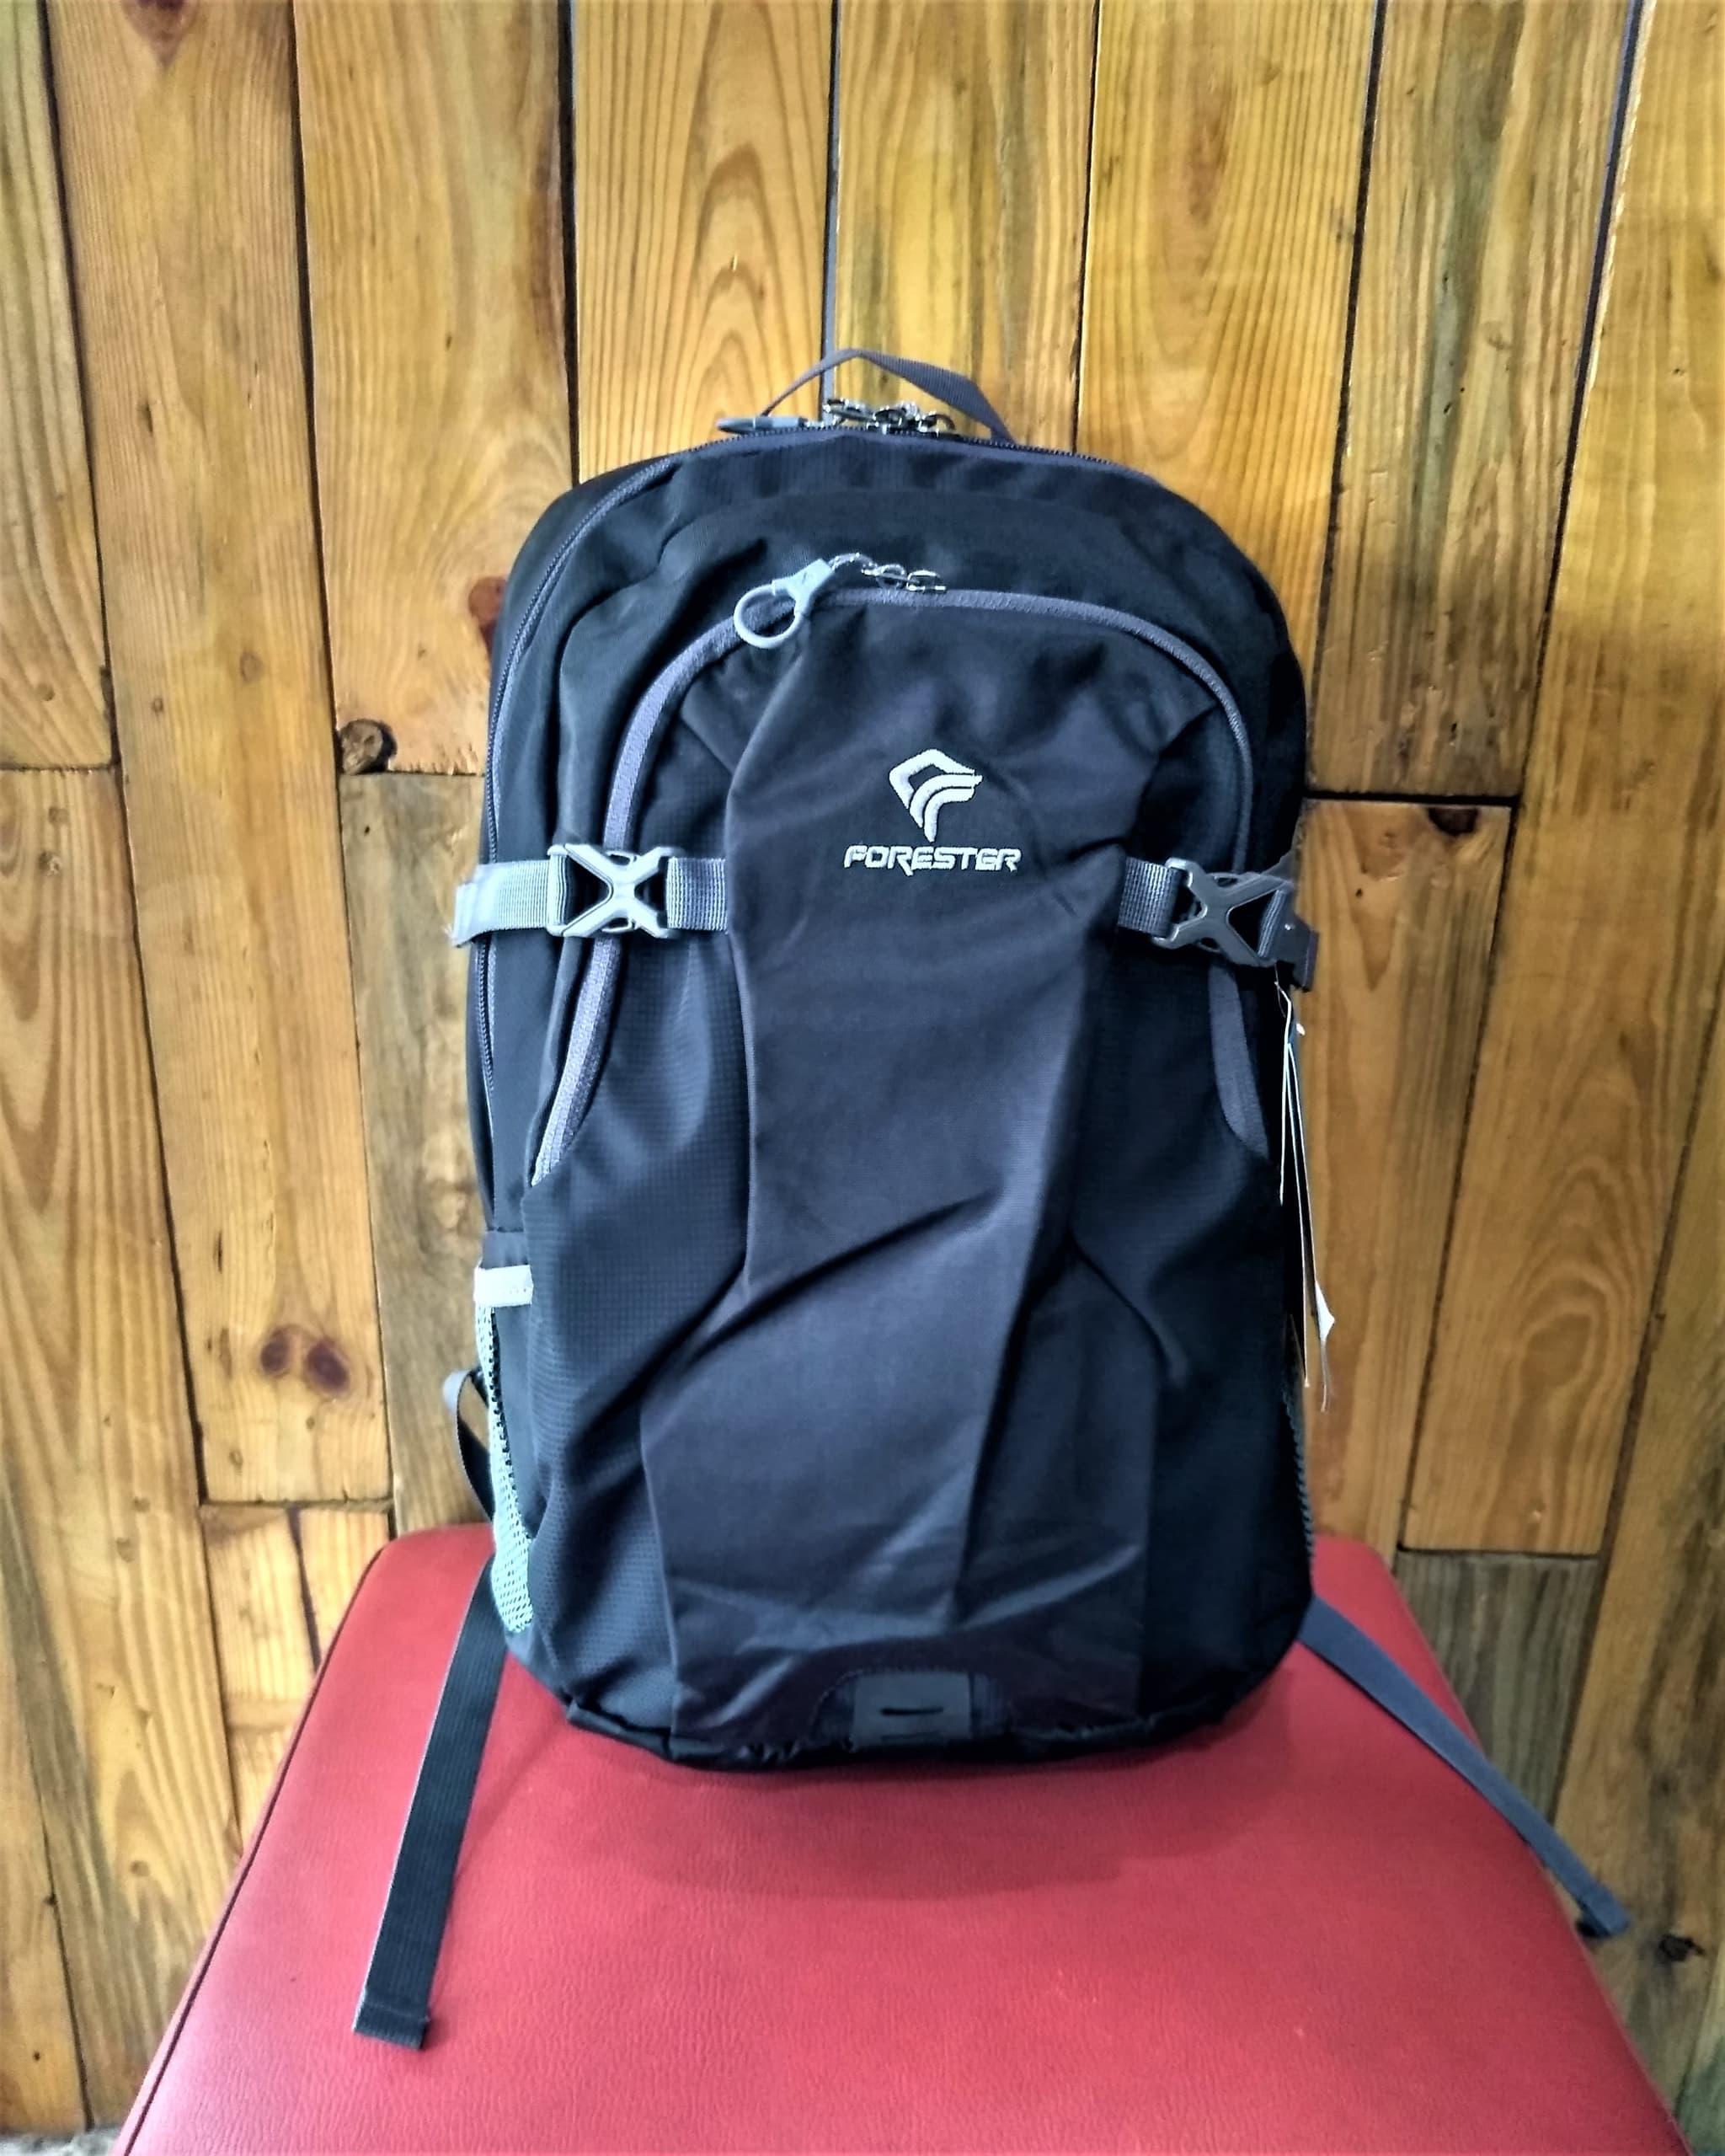 HEMAT Daypack FORESTER SPEED BACK-Tas Harian-Tas Ransel-Tas Laptop-Tas eef7a3b753